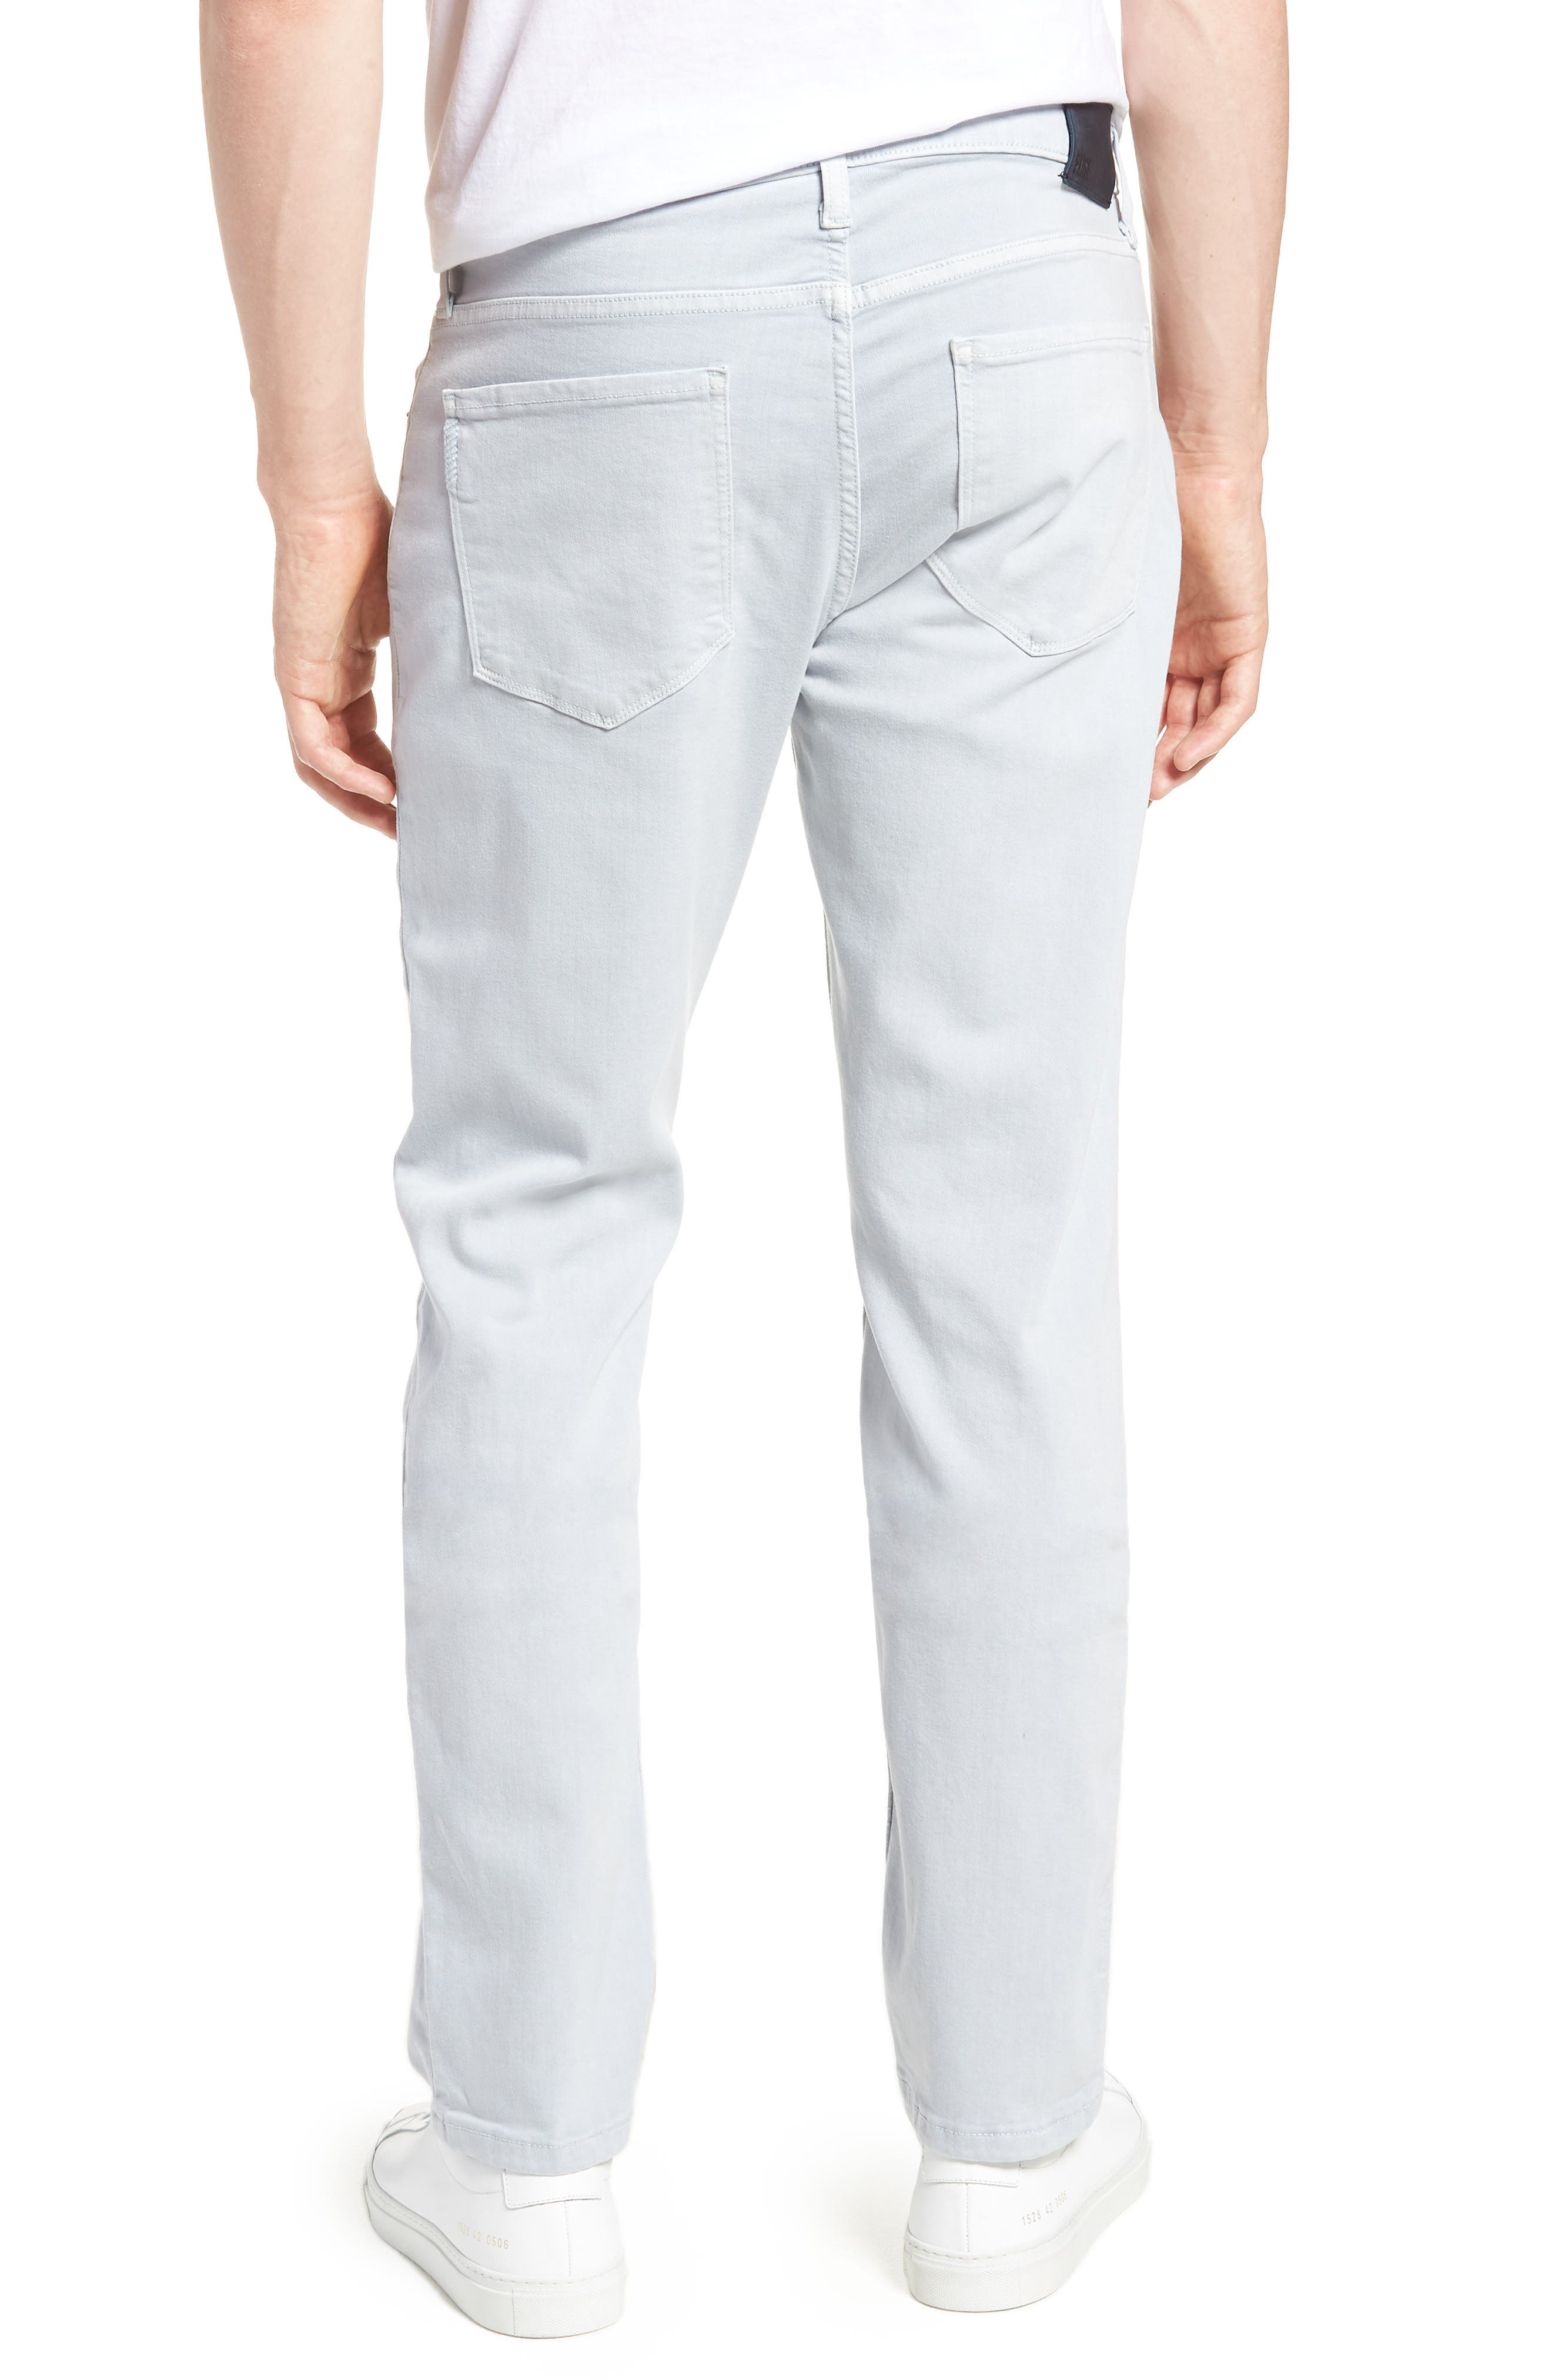 Transcend - Federal Slim Straight Leg Jeans,                             Alternate thumbnail 2, color,                             450